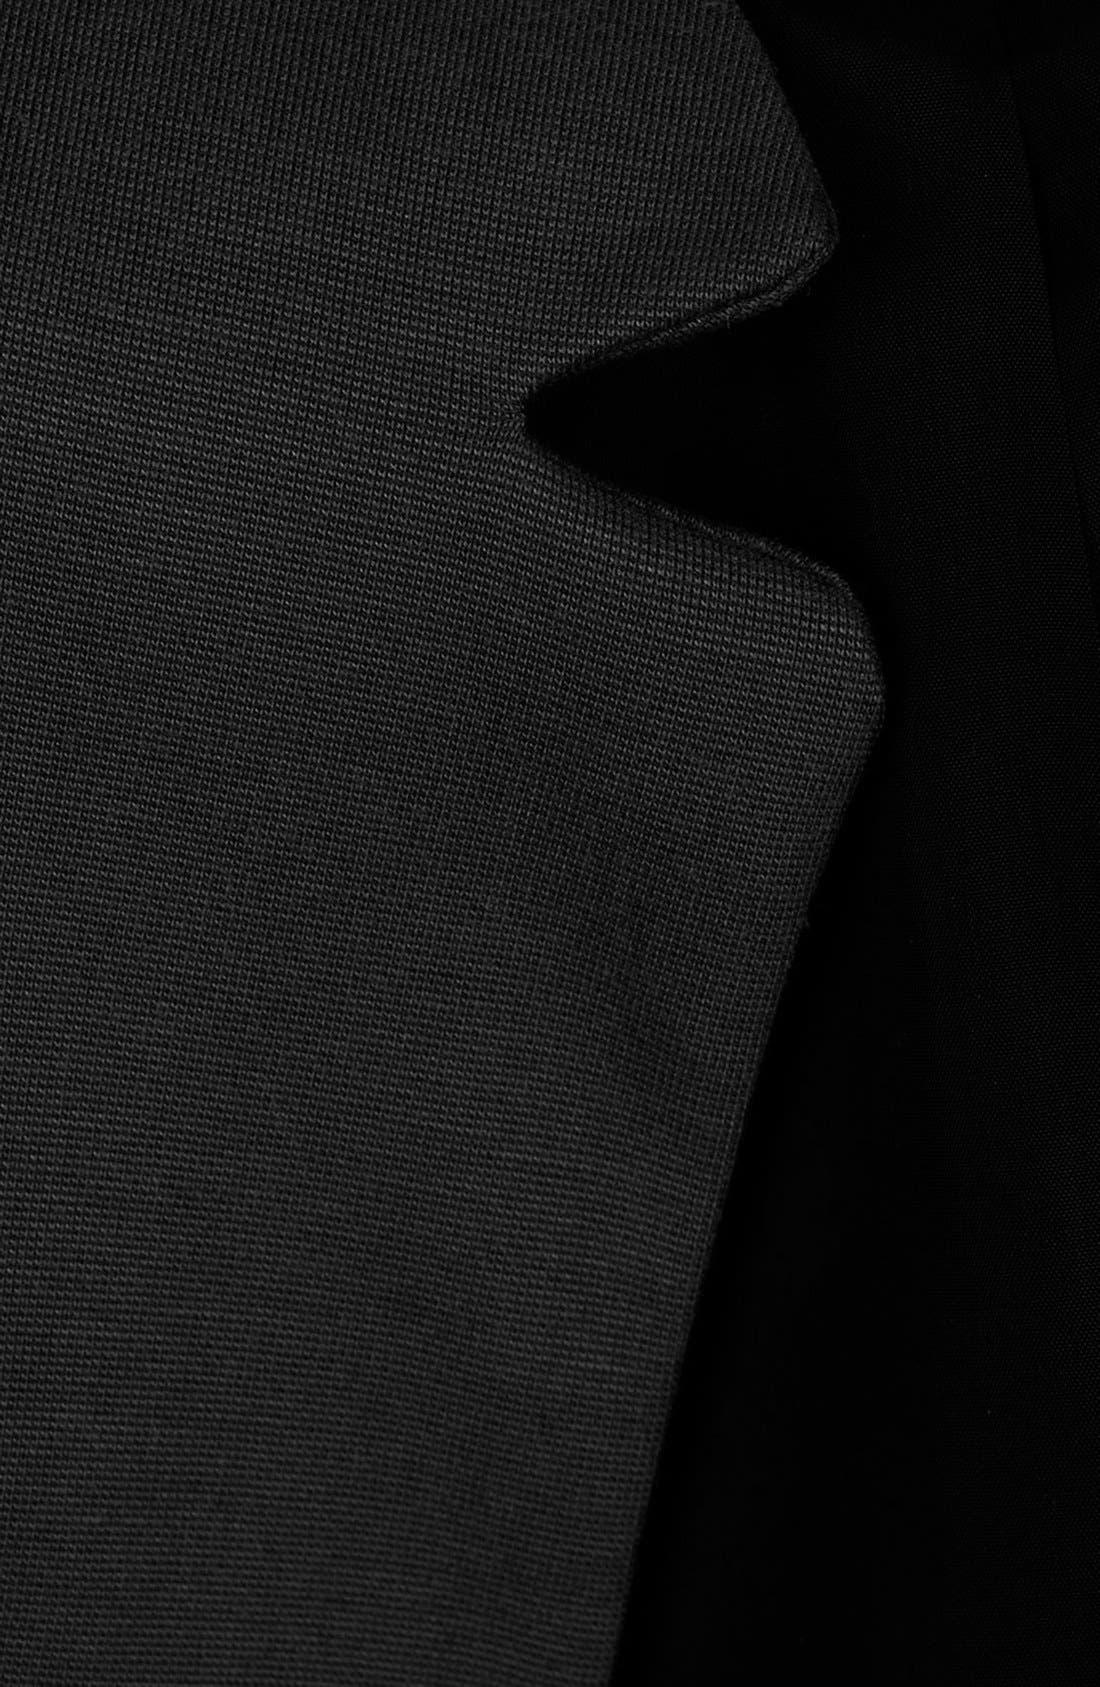 'Romeo' Inverted Lapel Blazer,                             Alternate thumbnail 3, color,                             001